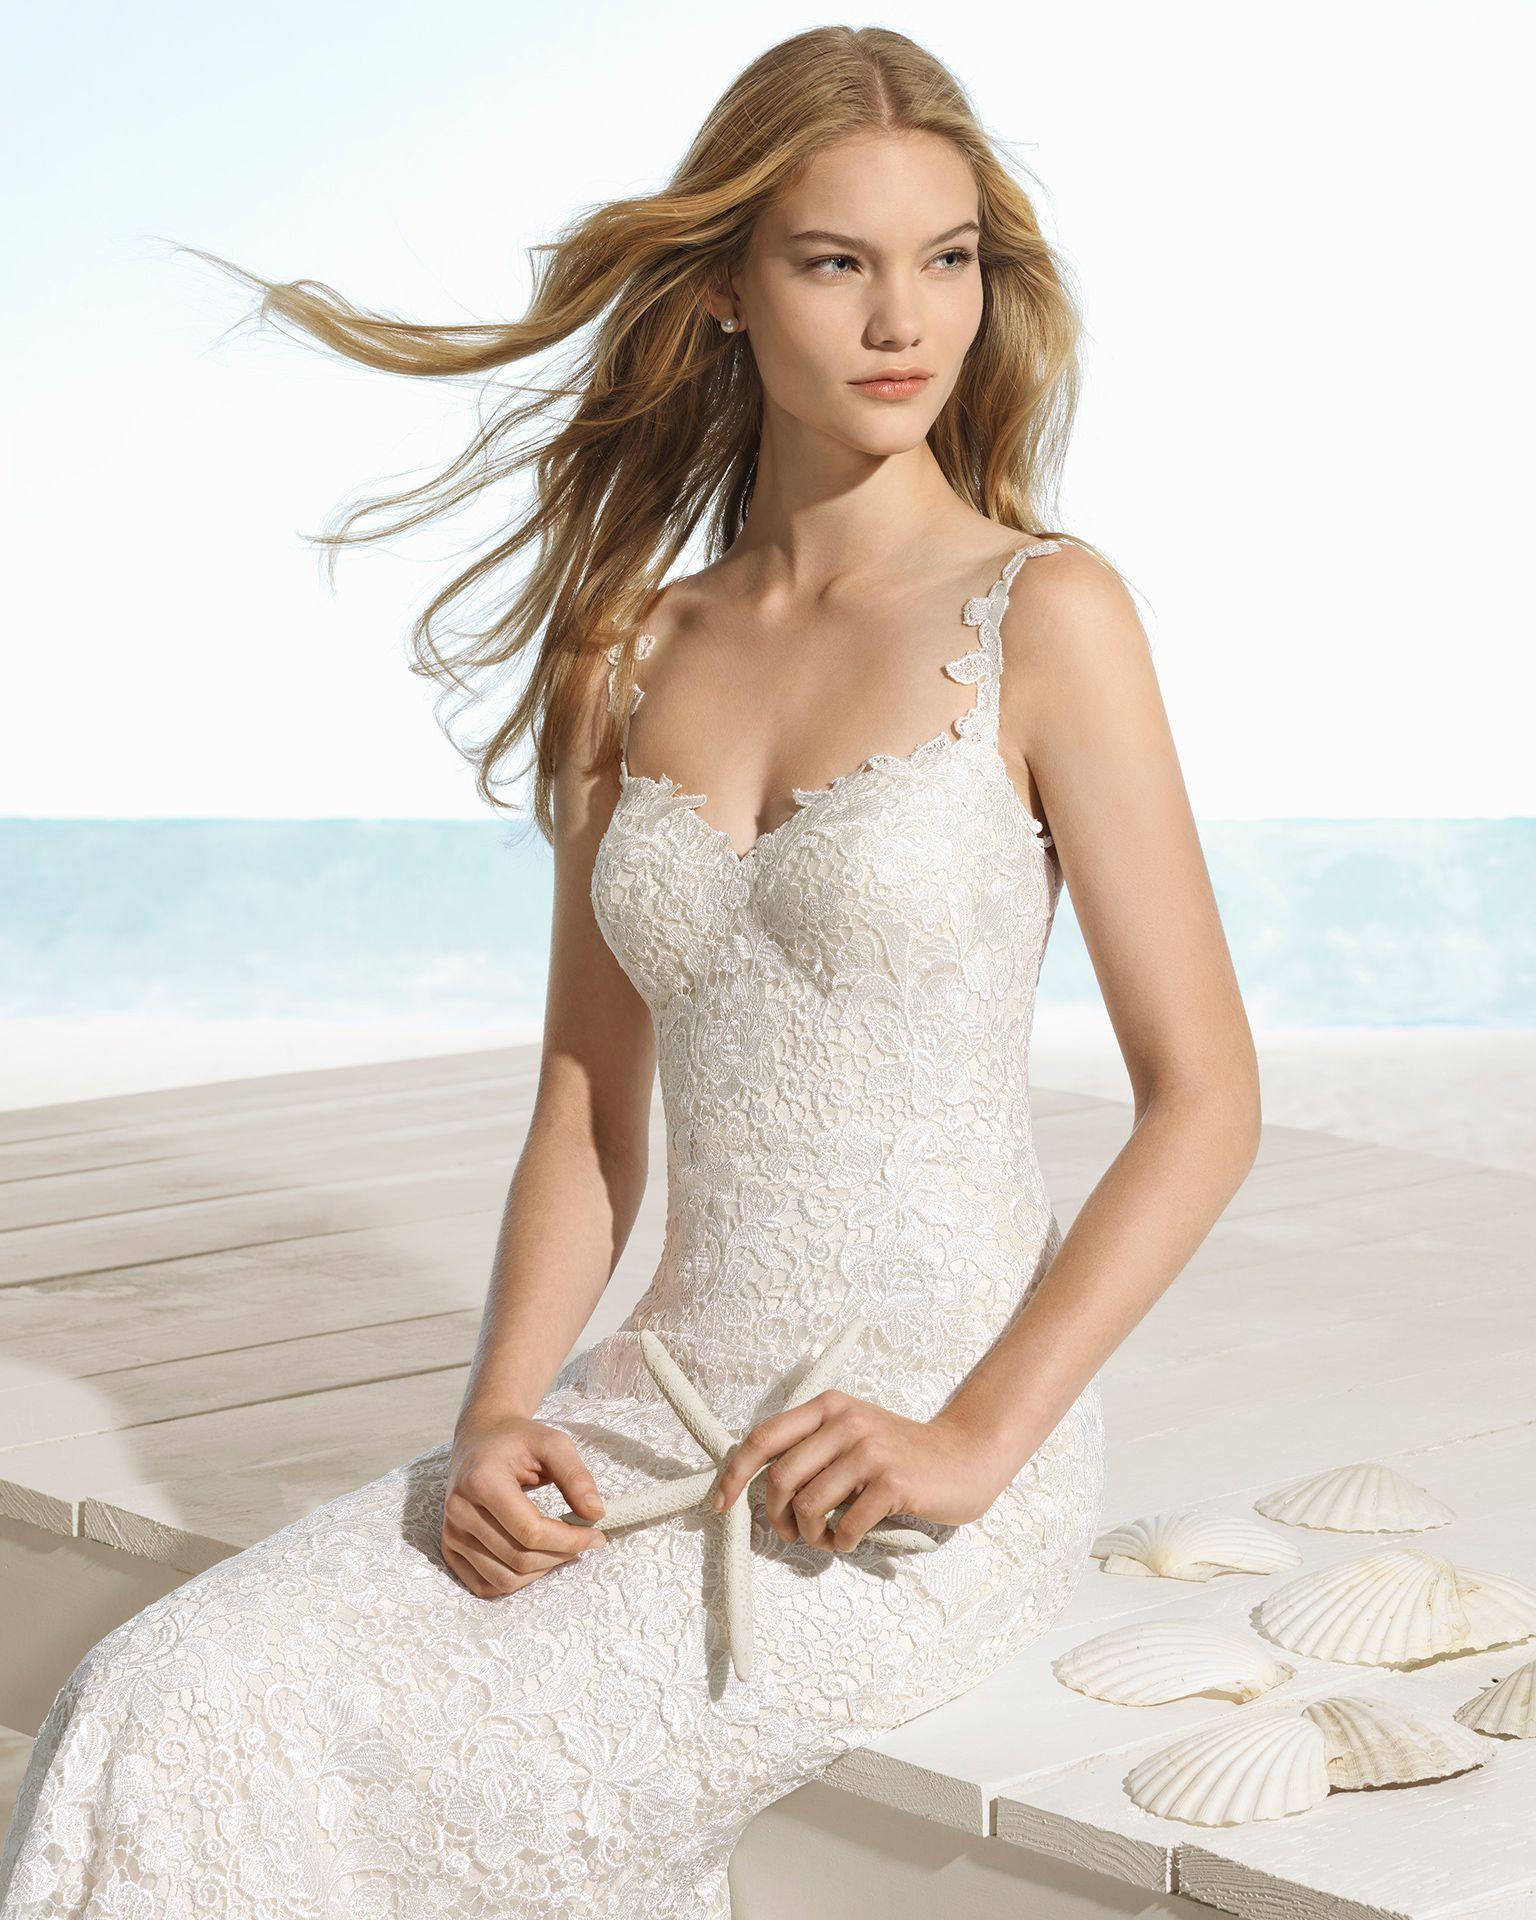 Uvalairebeachg wedding dress pinterest